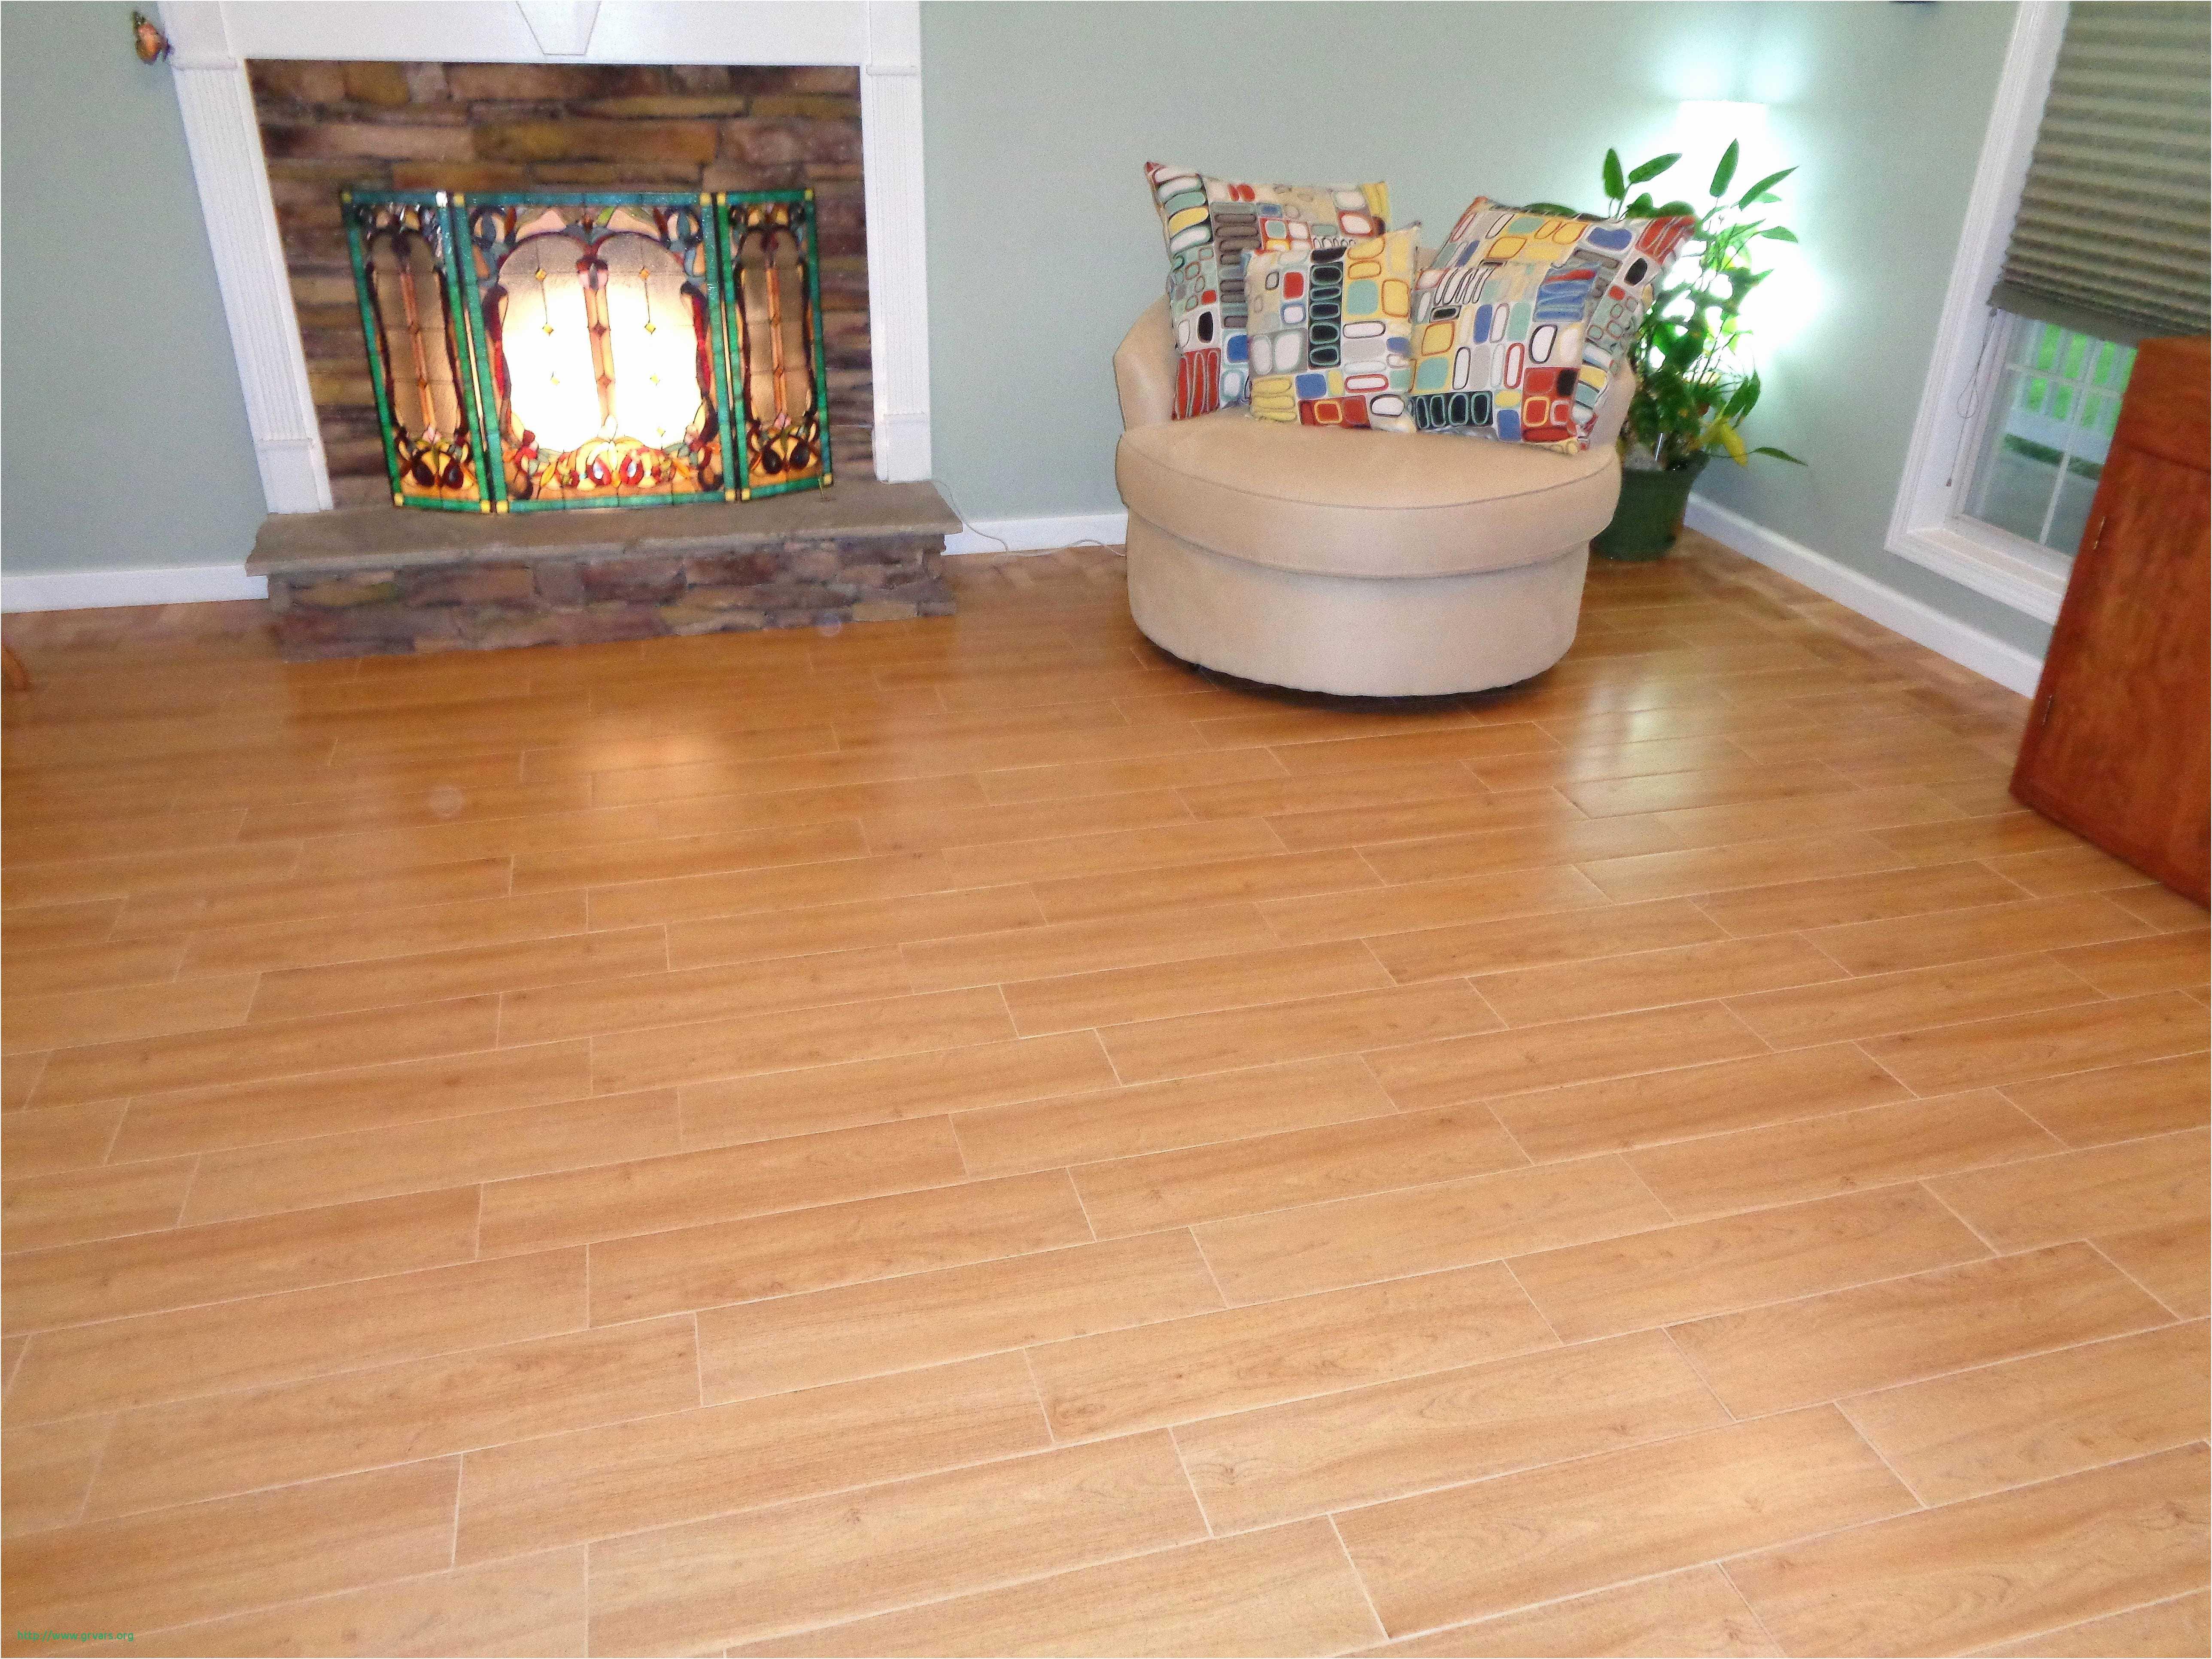 engineered hardwood flooring vs hardwood flooring of 24 inspirant what is the difference between laminate and engineered regarding laminate wood flooring sale laminate wood flooring sale best clearance flooring 0d unique